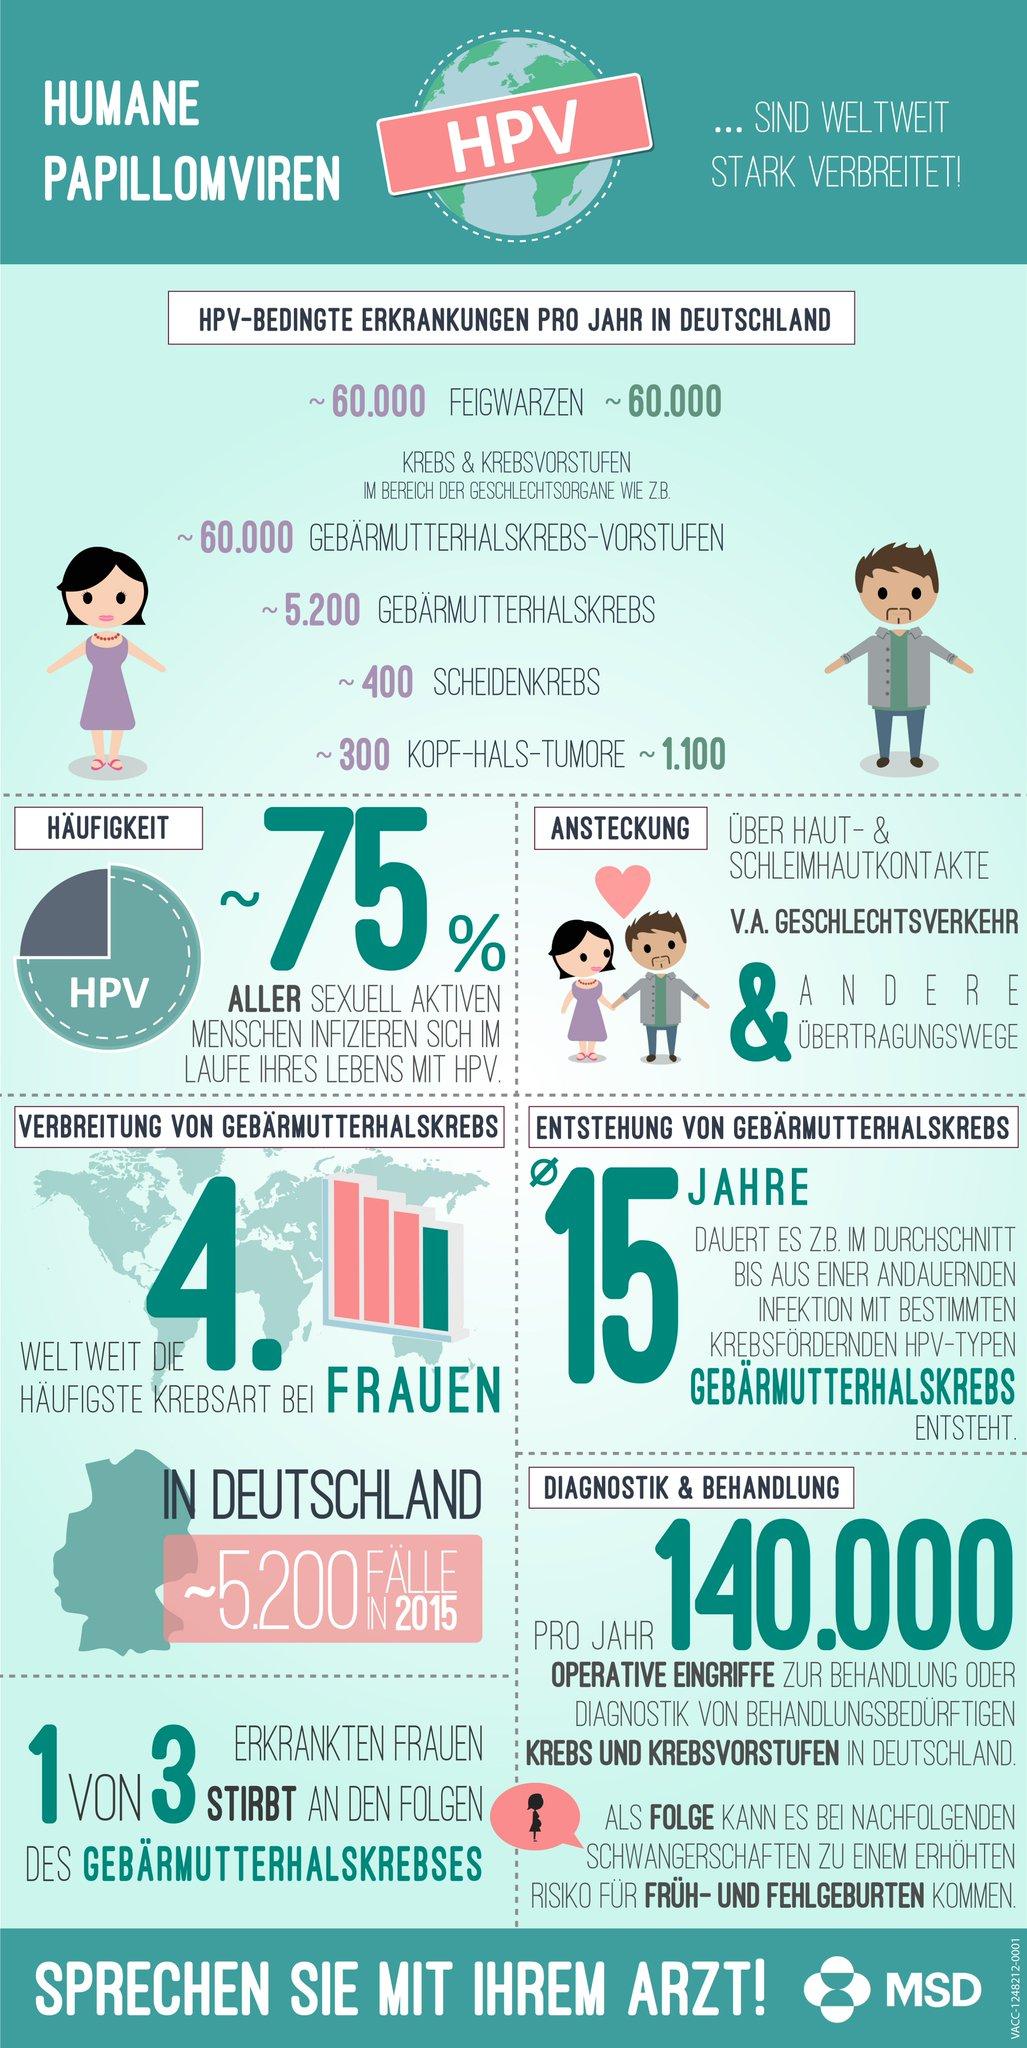 papillomavirus gebarmutterhalskrebs)